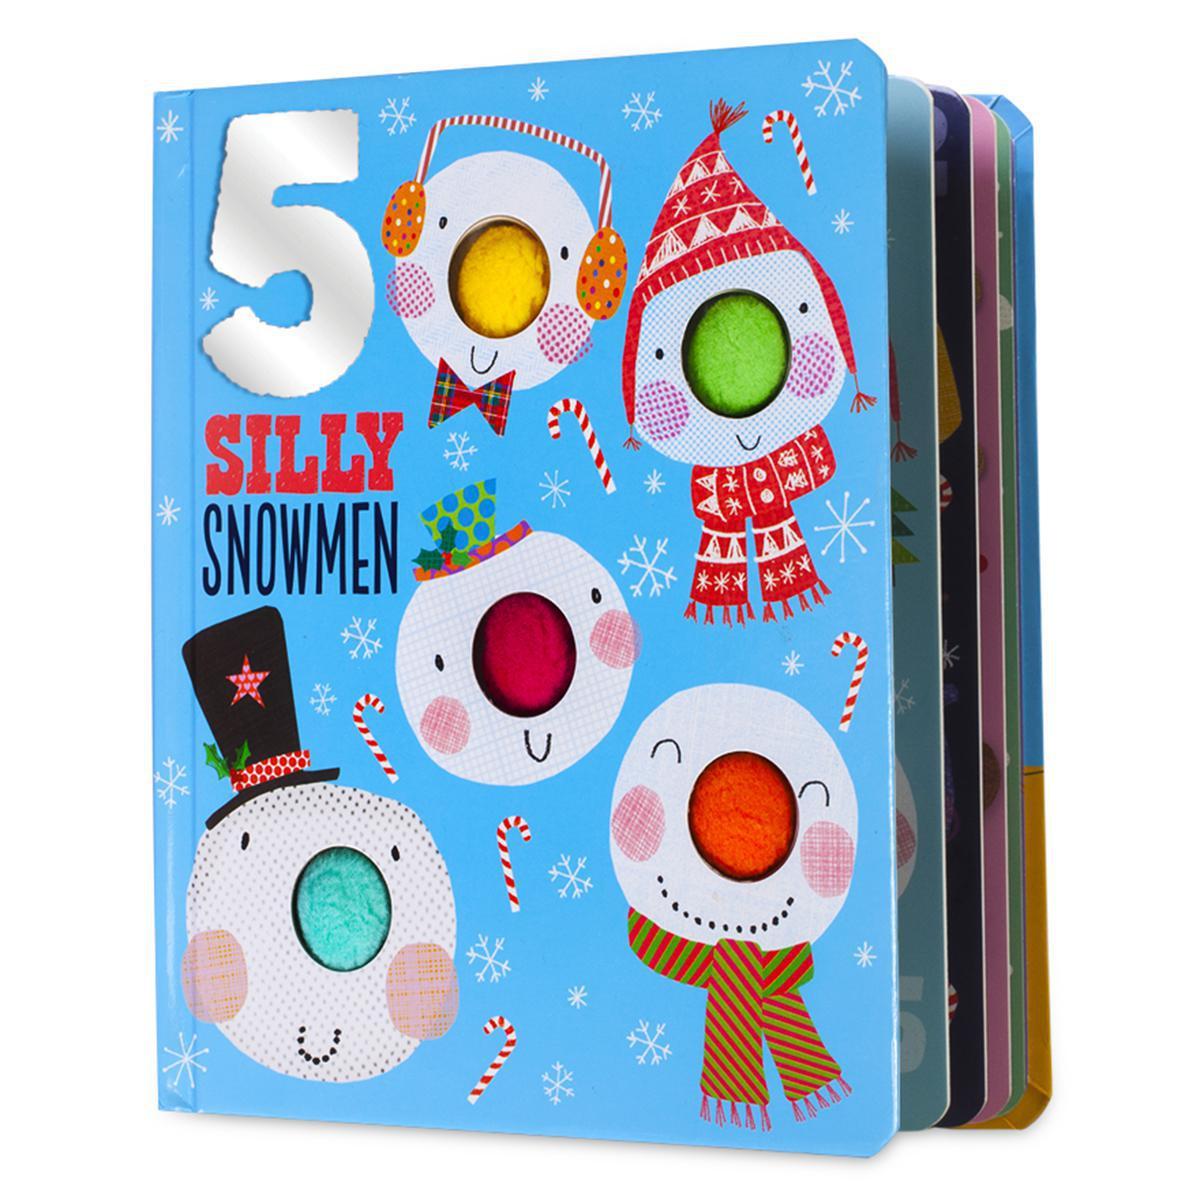 Five Silly Snowmen